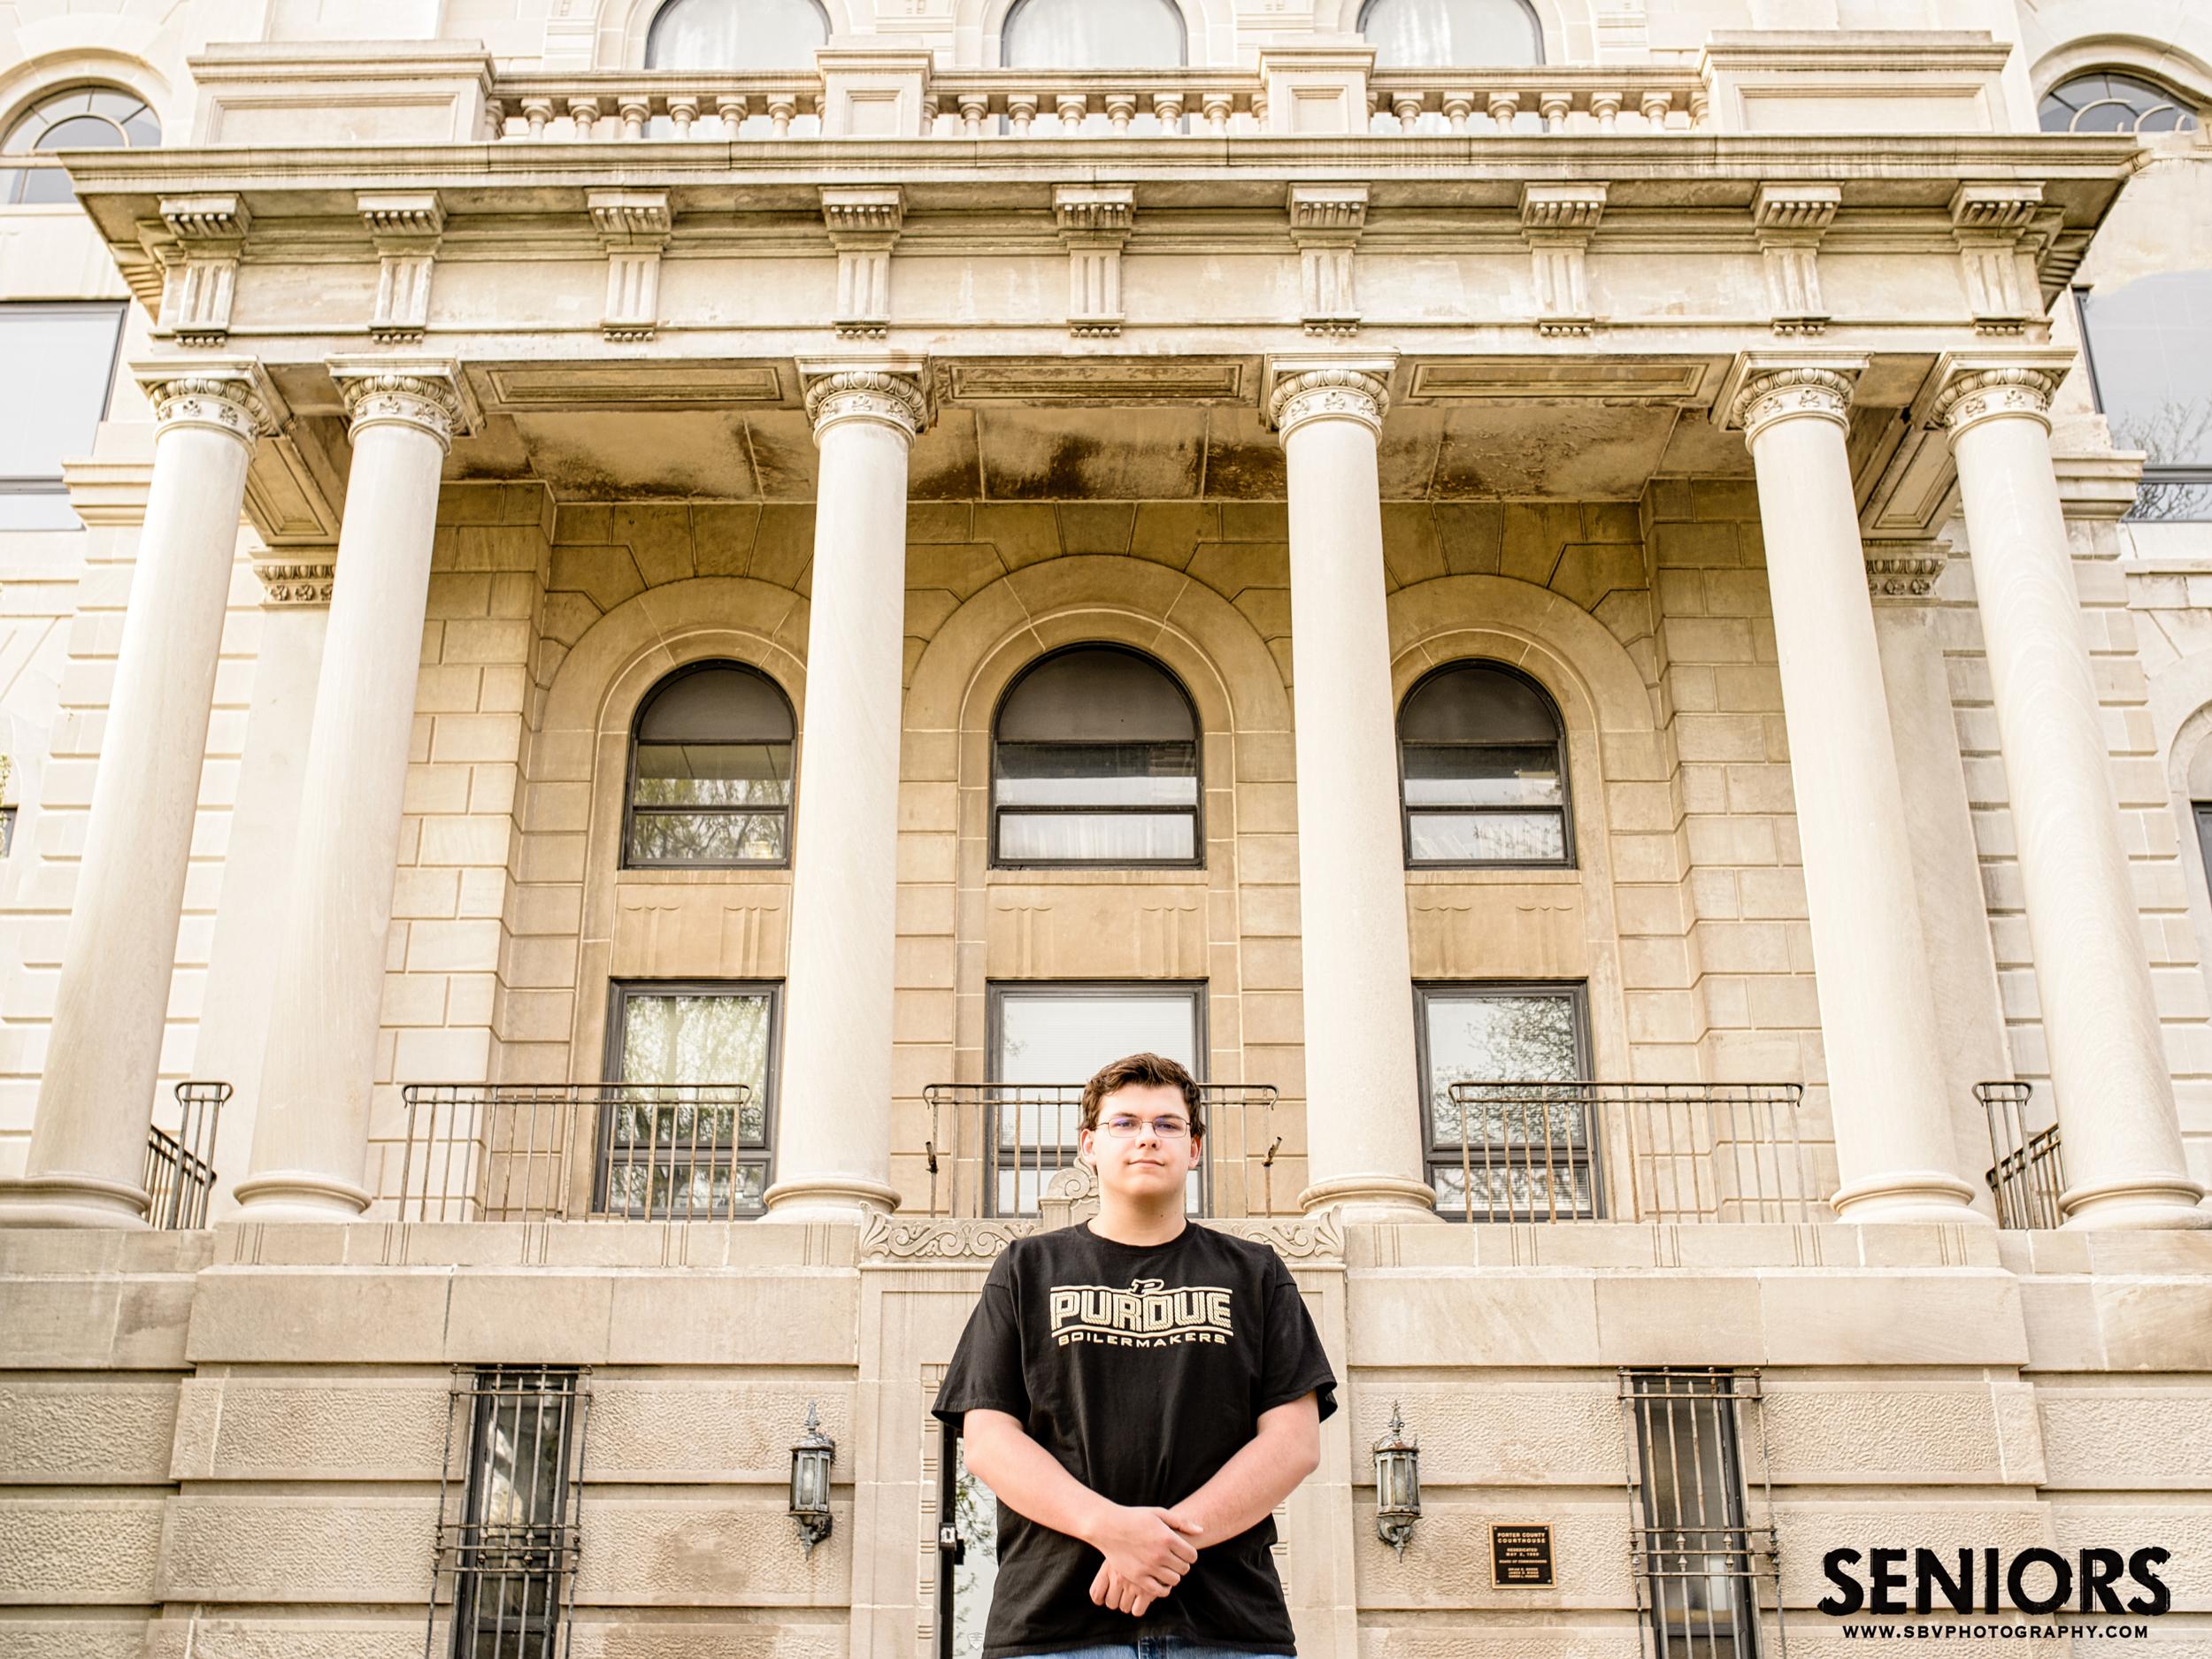 Senior photo at the Porter County Courthouse in Valparaiso, Indiana.